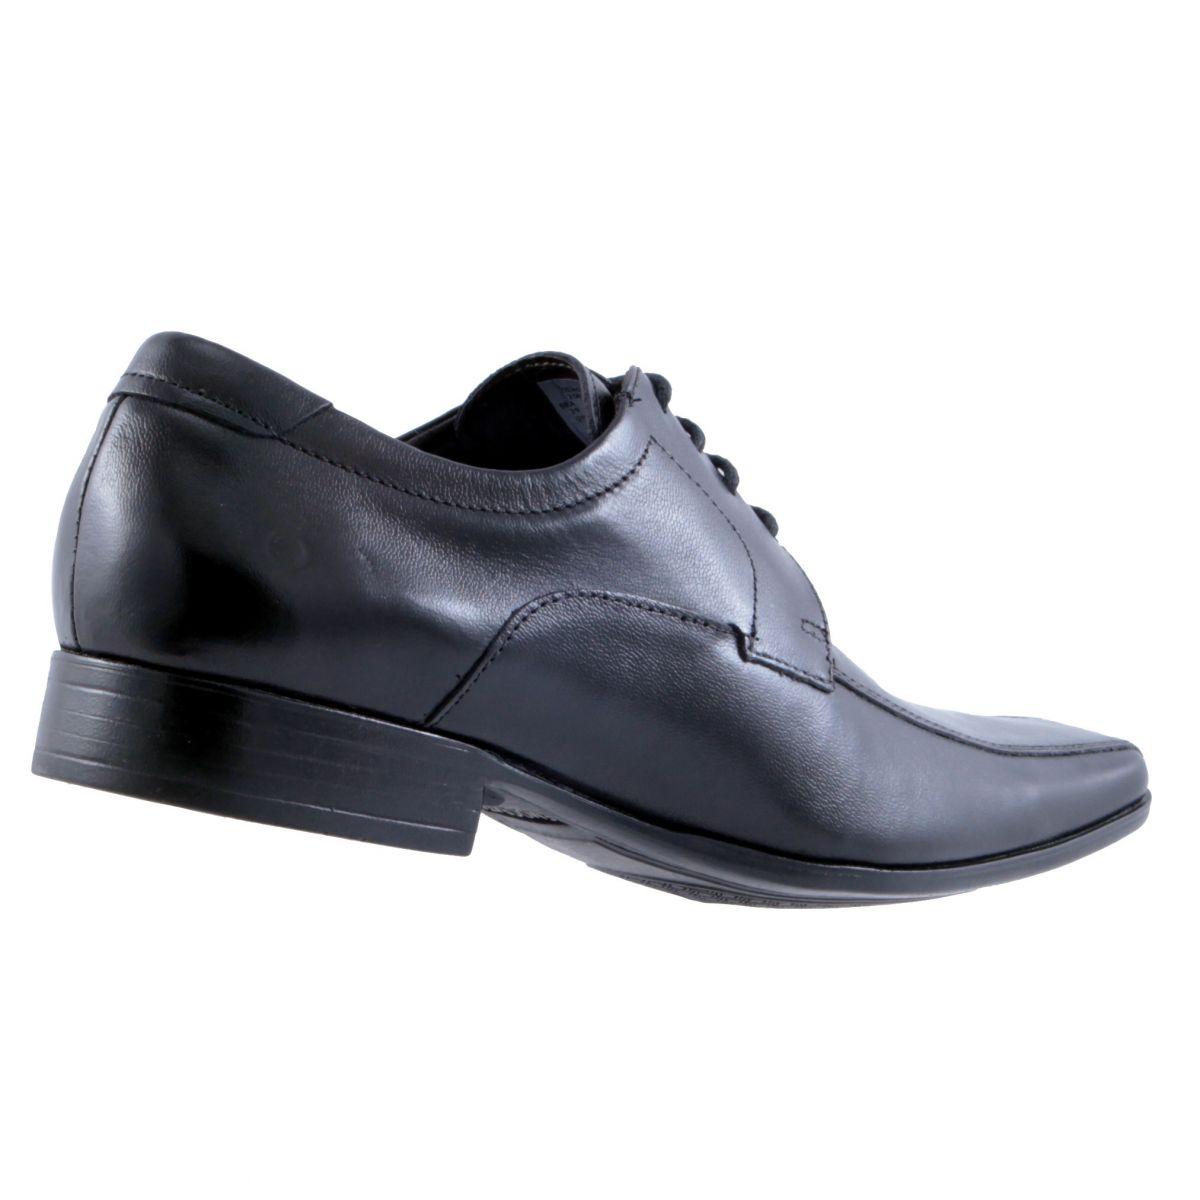 Sapato Social Democrata Premier Couro Legítimo 206285  - Ian Calçados